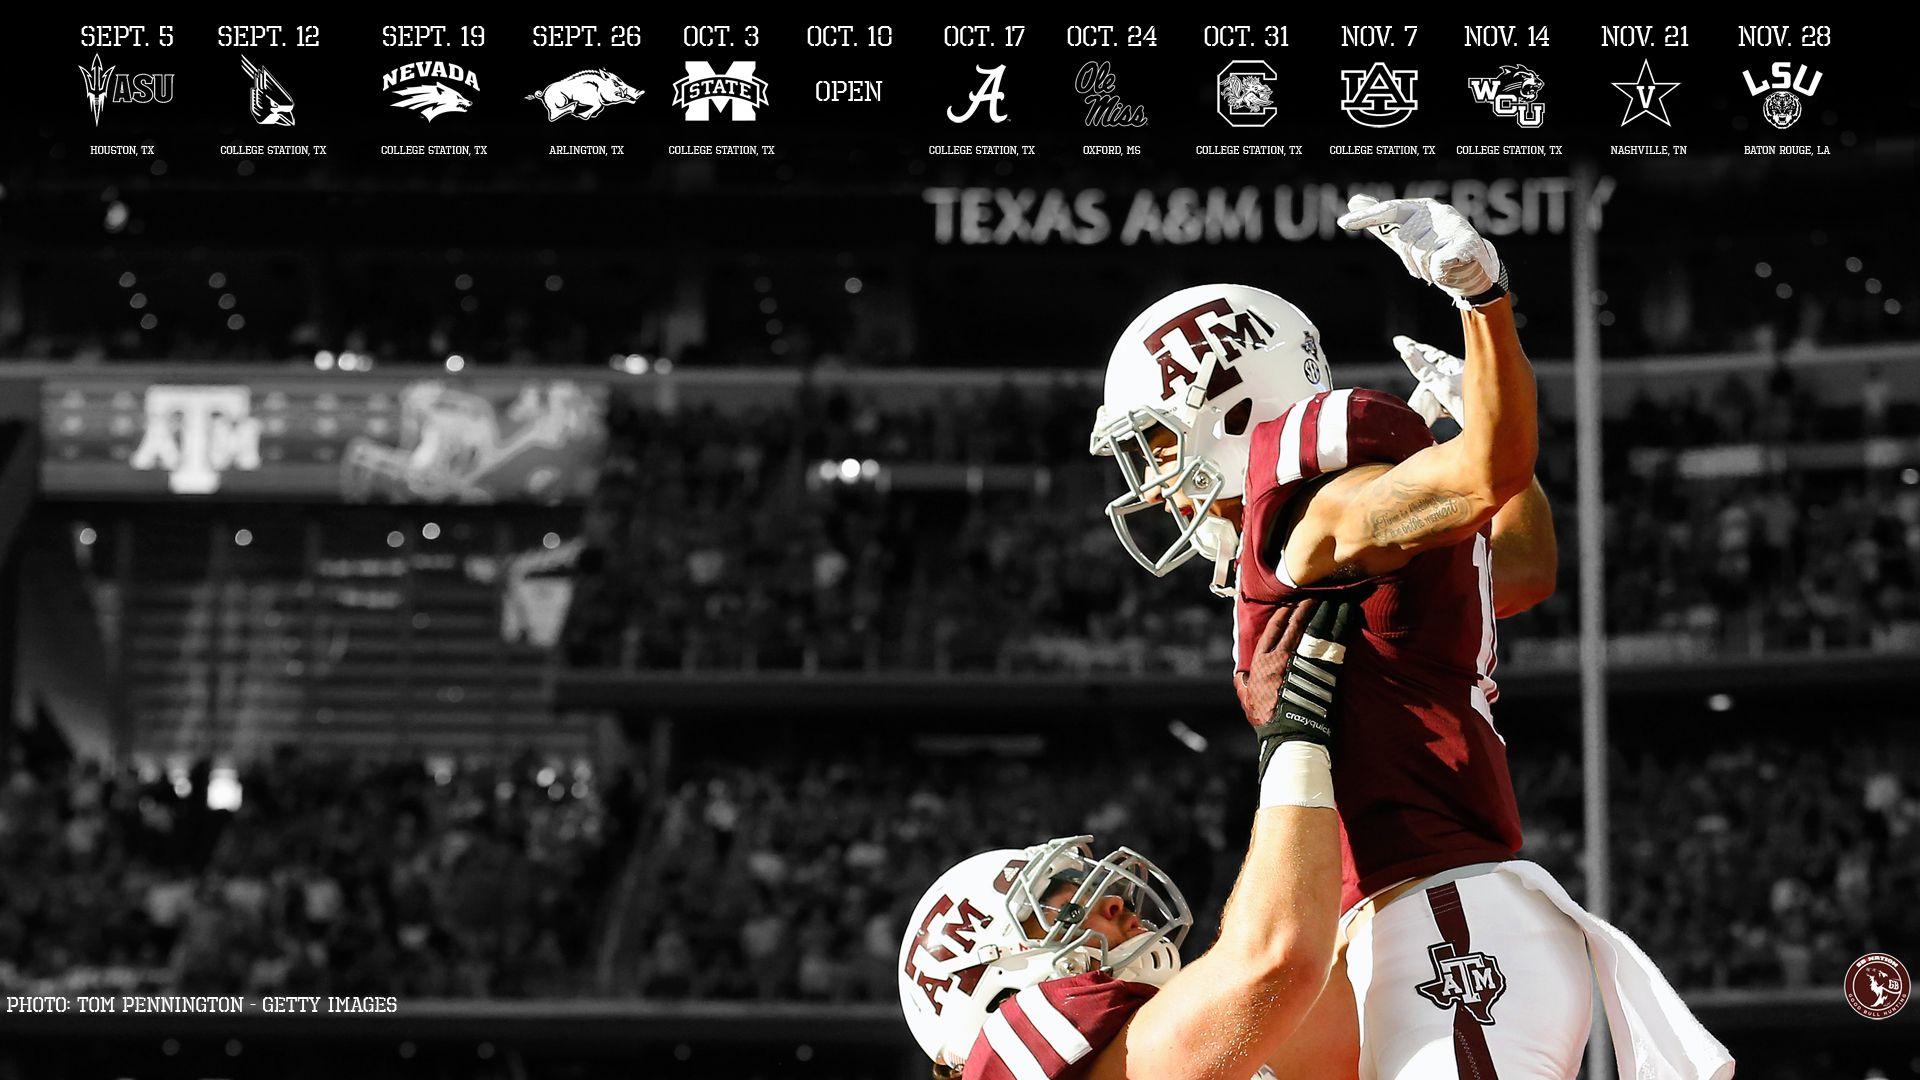 Texas Sports Wallpaper